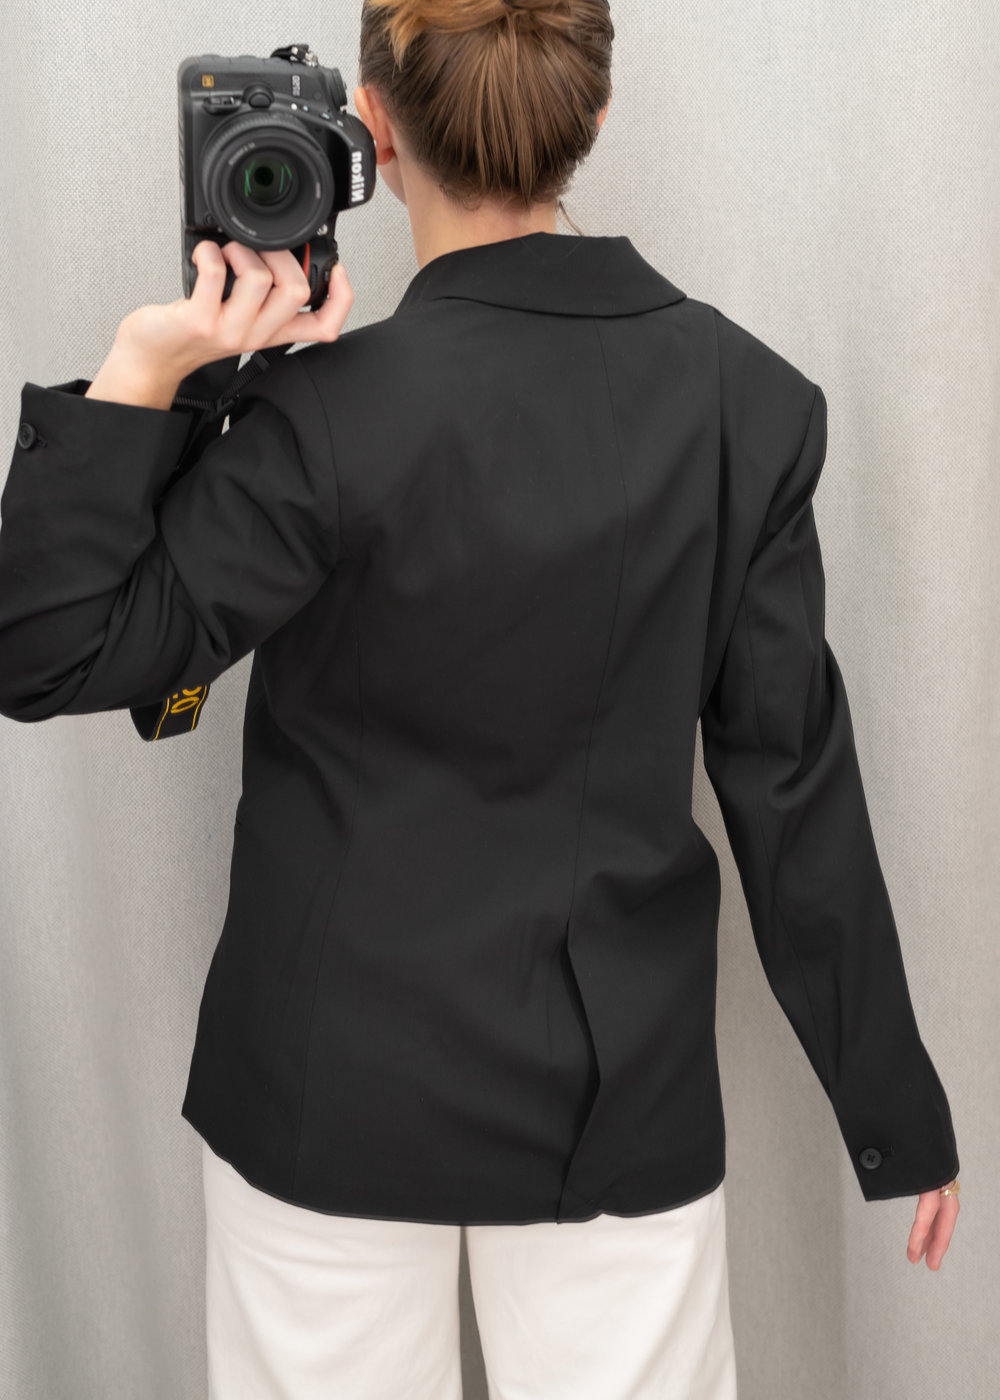 Everlane Italian GoWeave Classic Blazer - Size 6 - Back View